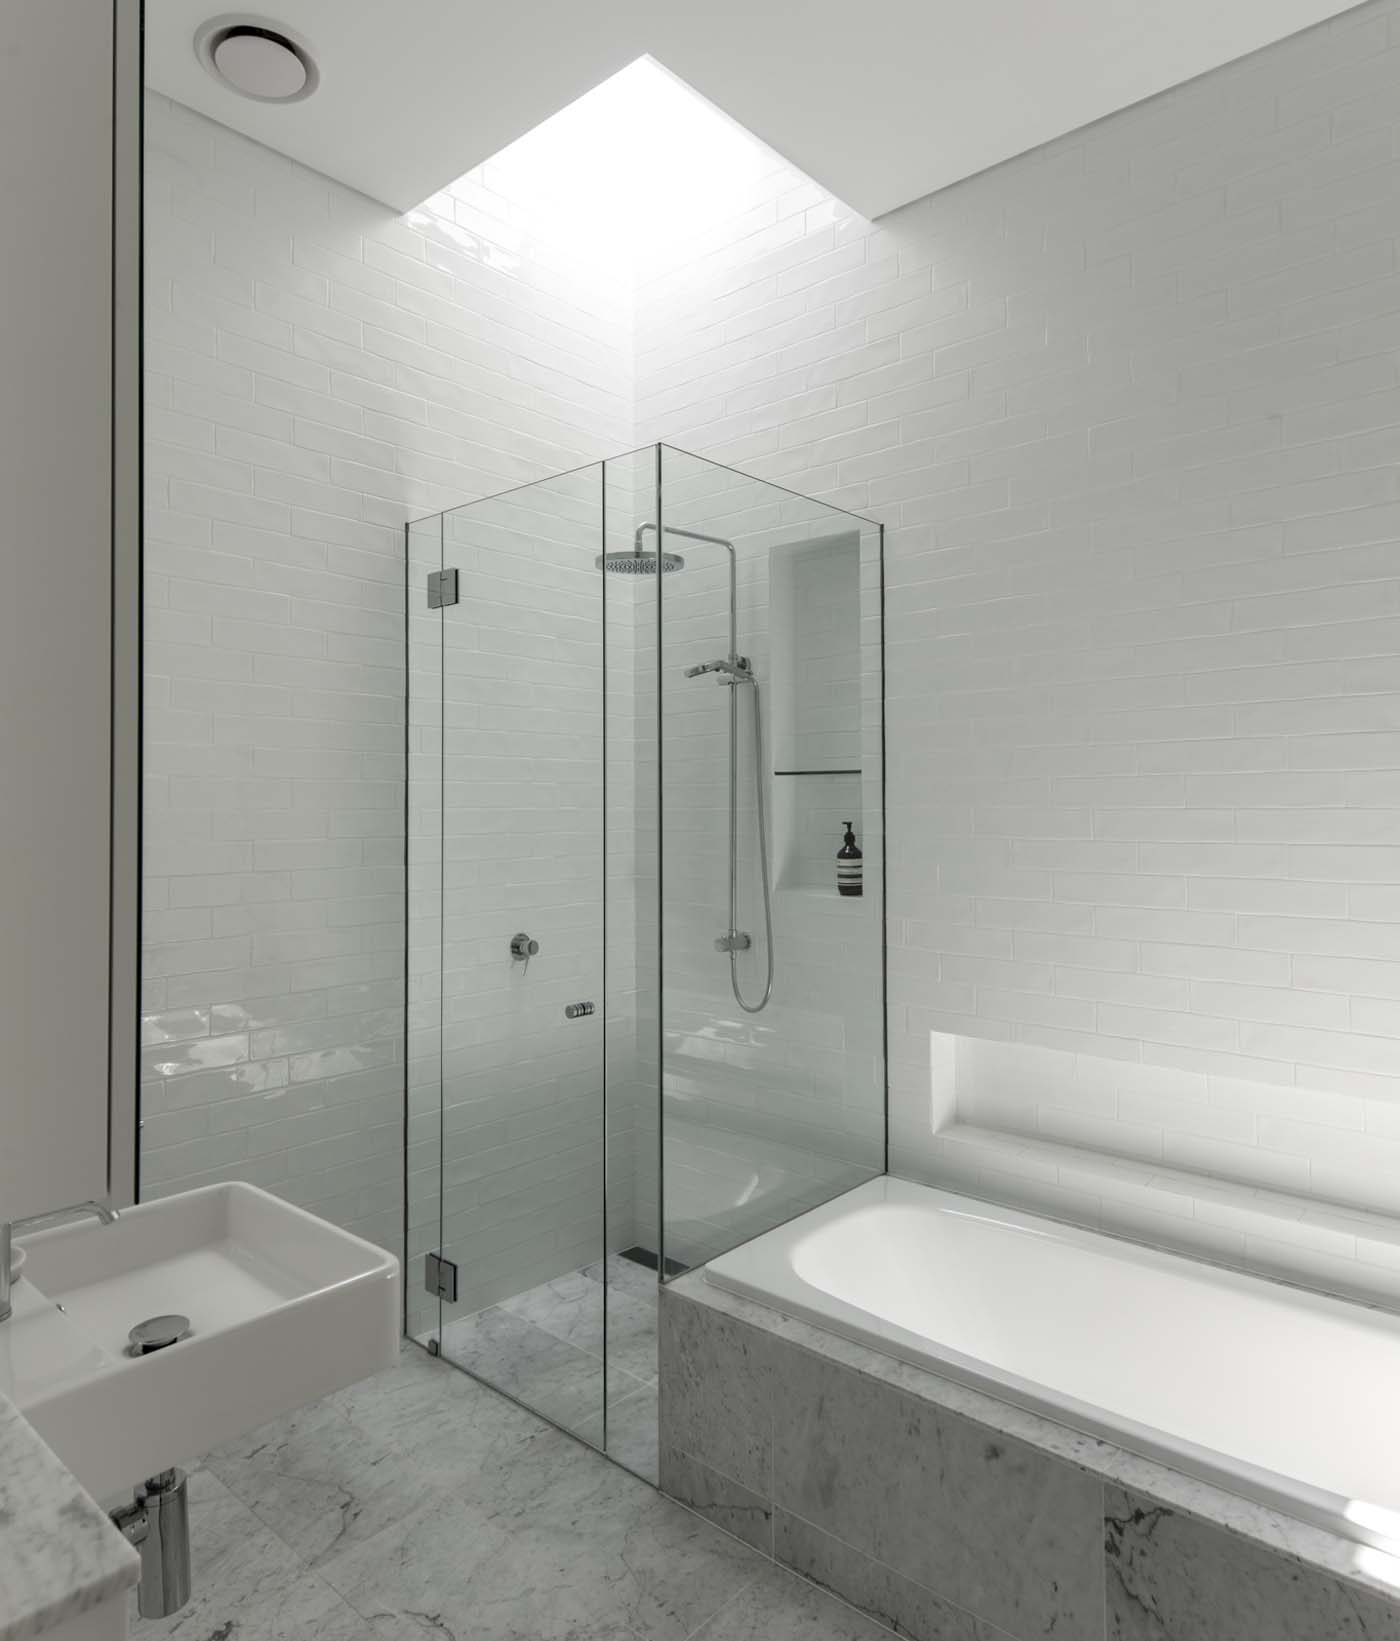 Sung Dobson house by Sam Crawford Architects, Sydney. Bathroom skylight.